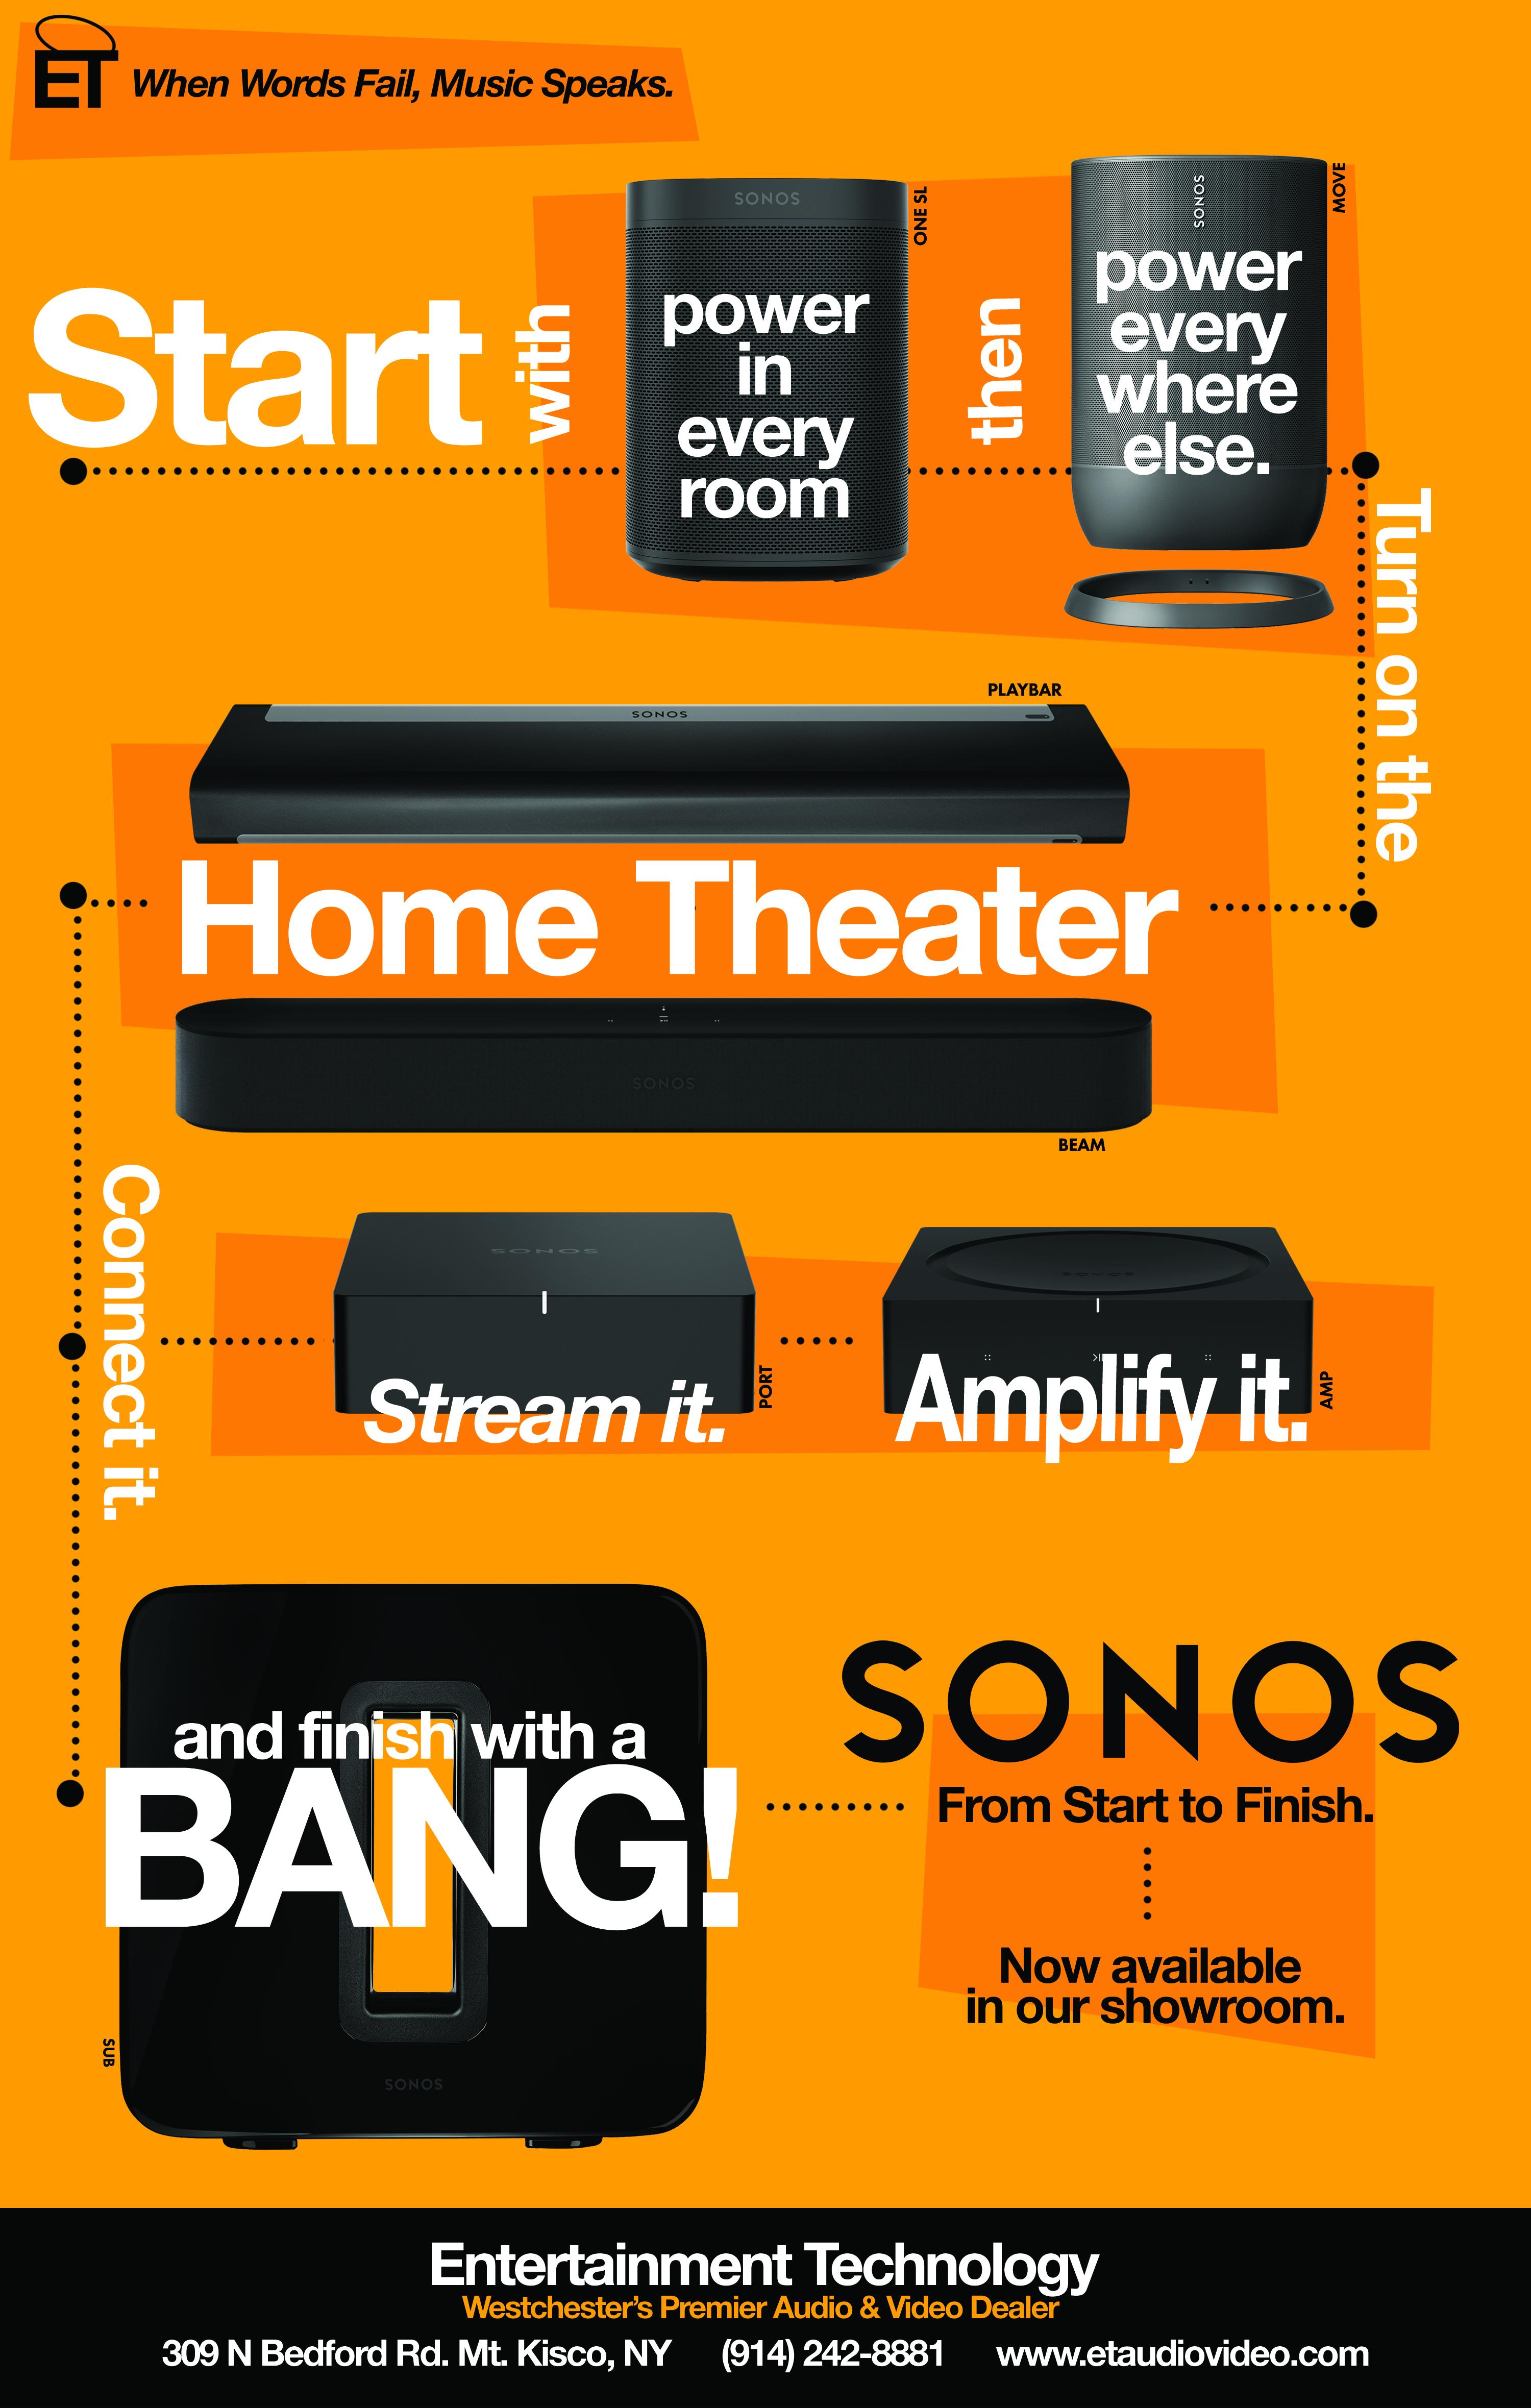 EntertainmentTech-Newspaper-Sonos02